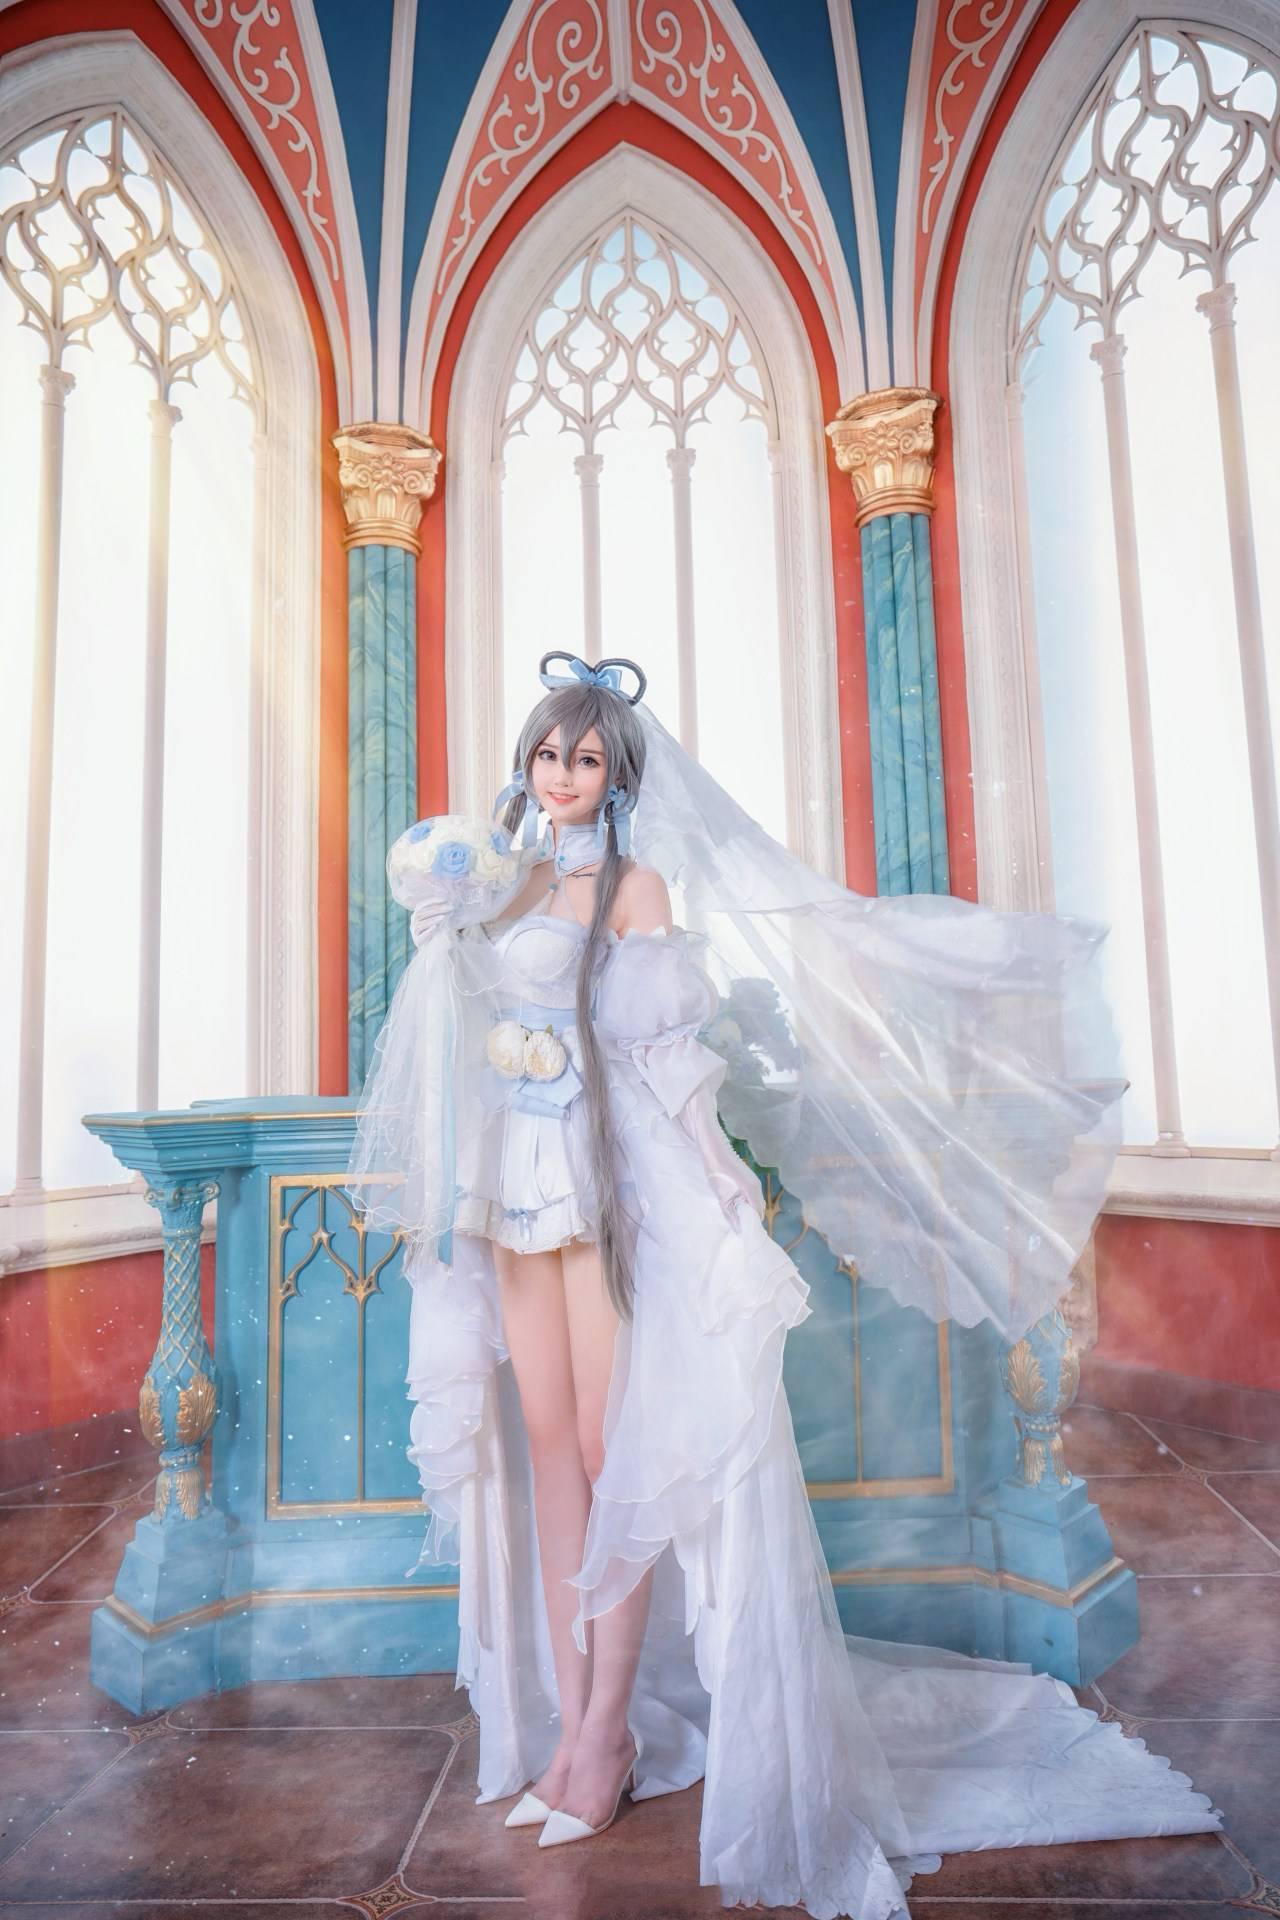 《VOCALOID》洛天依花嫁Cosplay【CN:露儿大魔王_】 (8P)-第7张